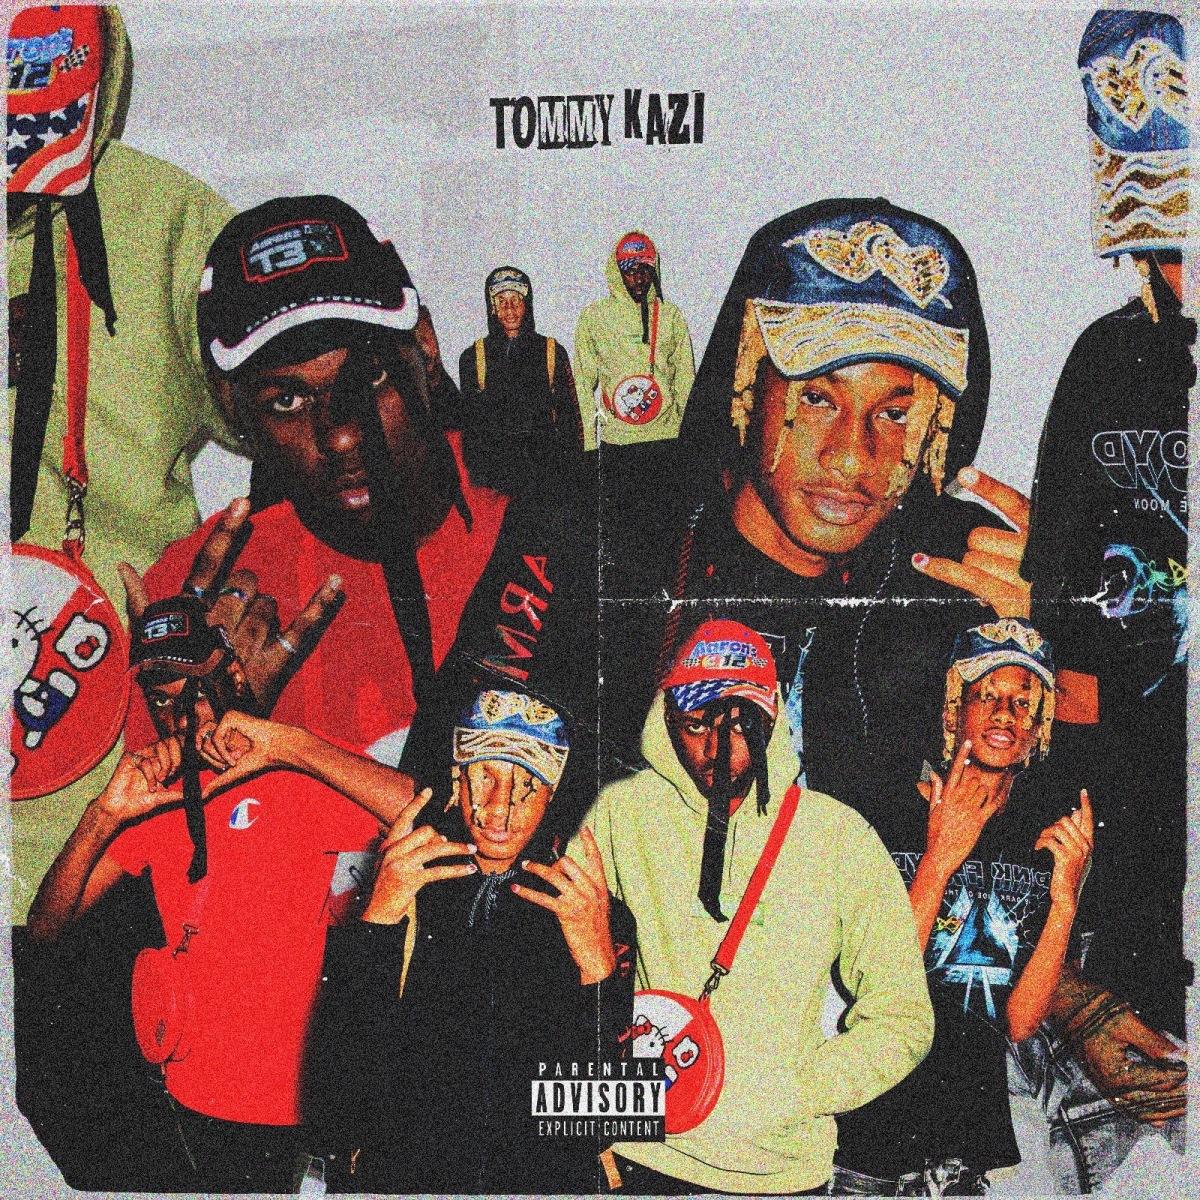 Tommy Ice & Kevin Kazi - TommyKazi (EP)